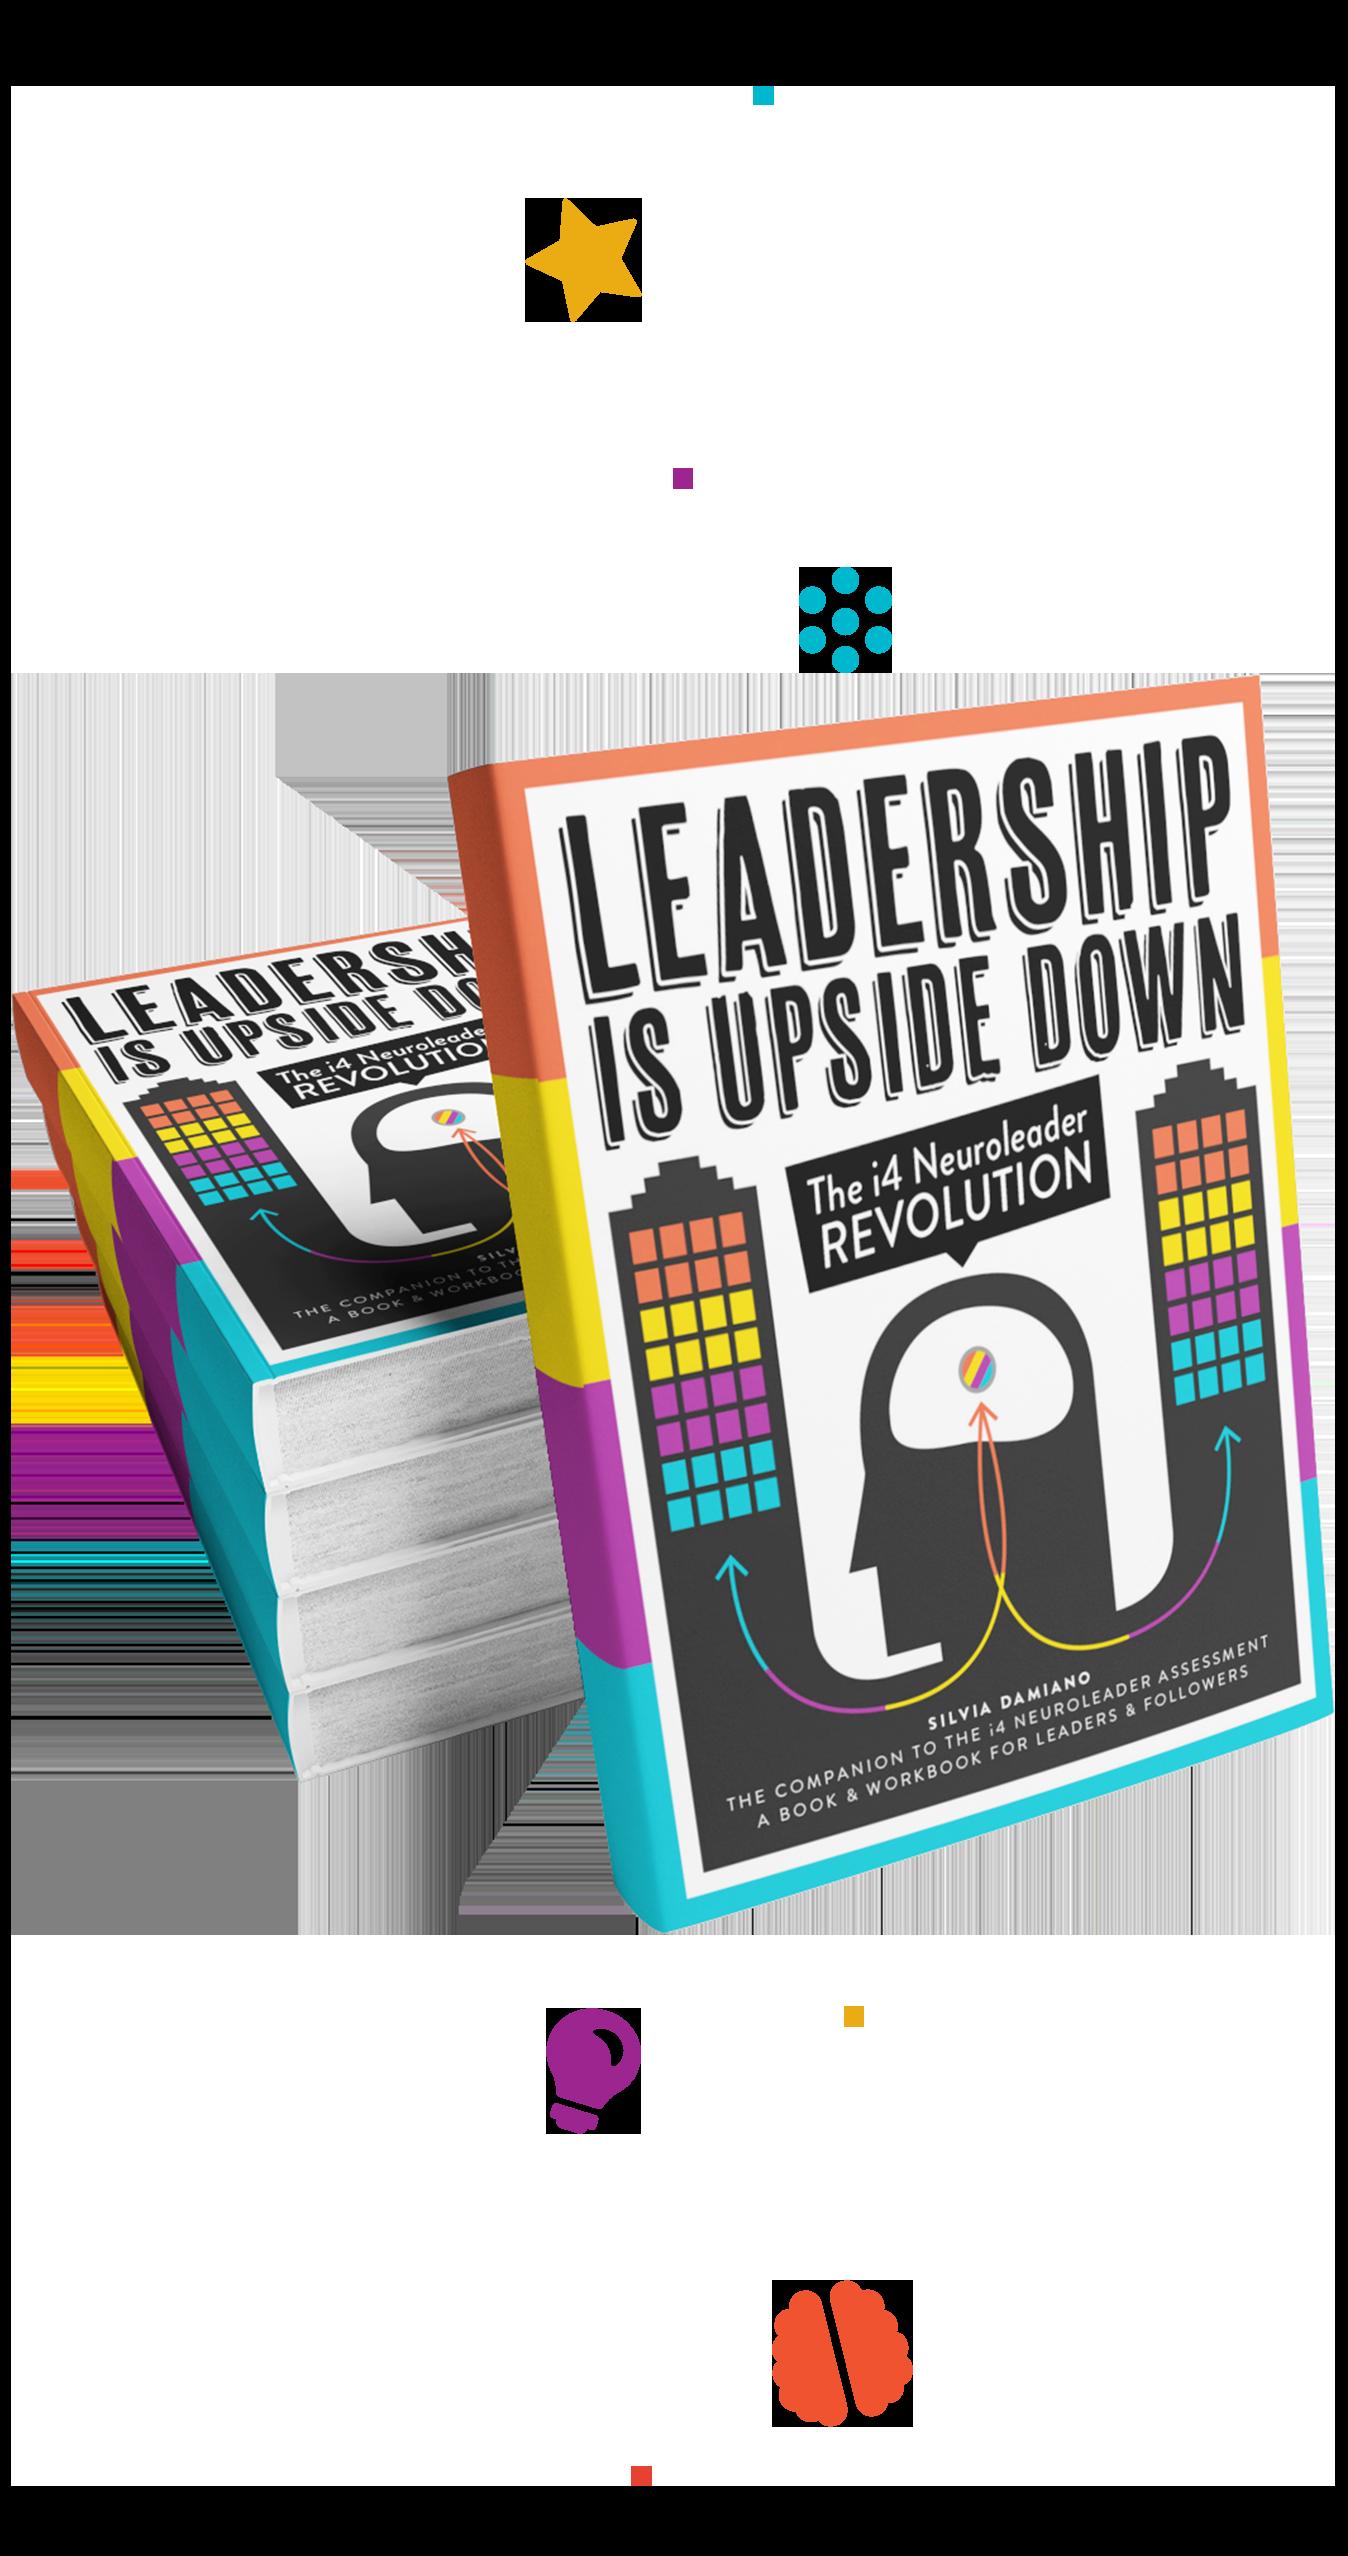 leadership-is-upside-down-i4-neuroleader-revolution